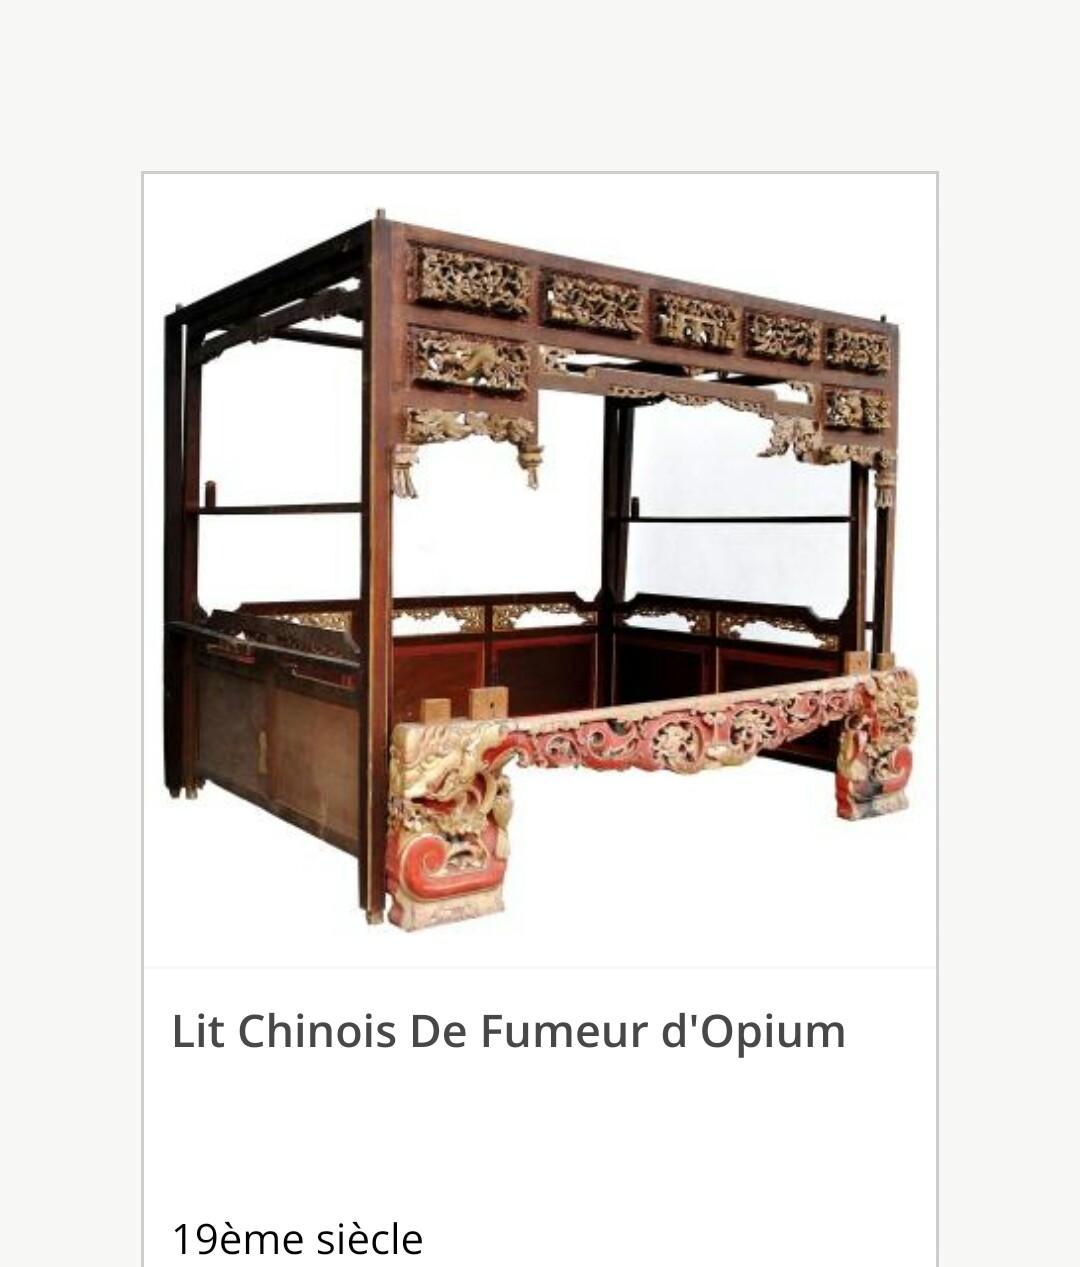 vend lit chinois baldaquin style mandarinxix sicle - Lit Chinois